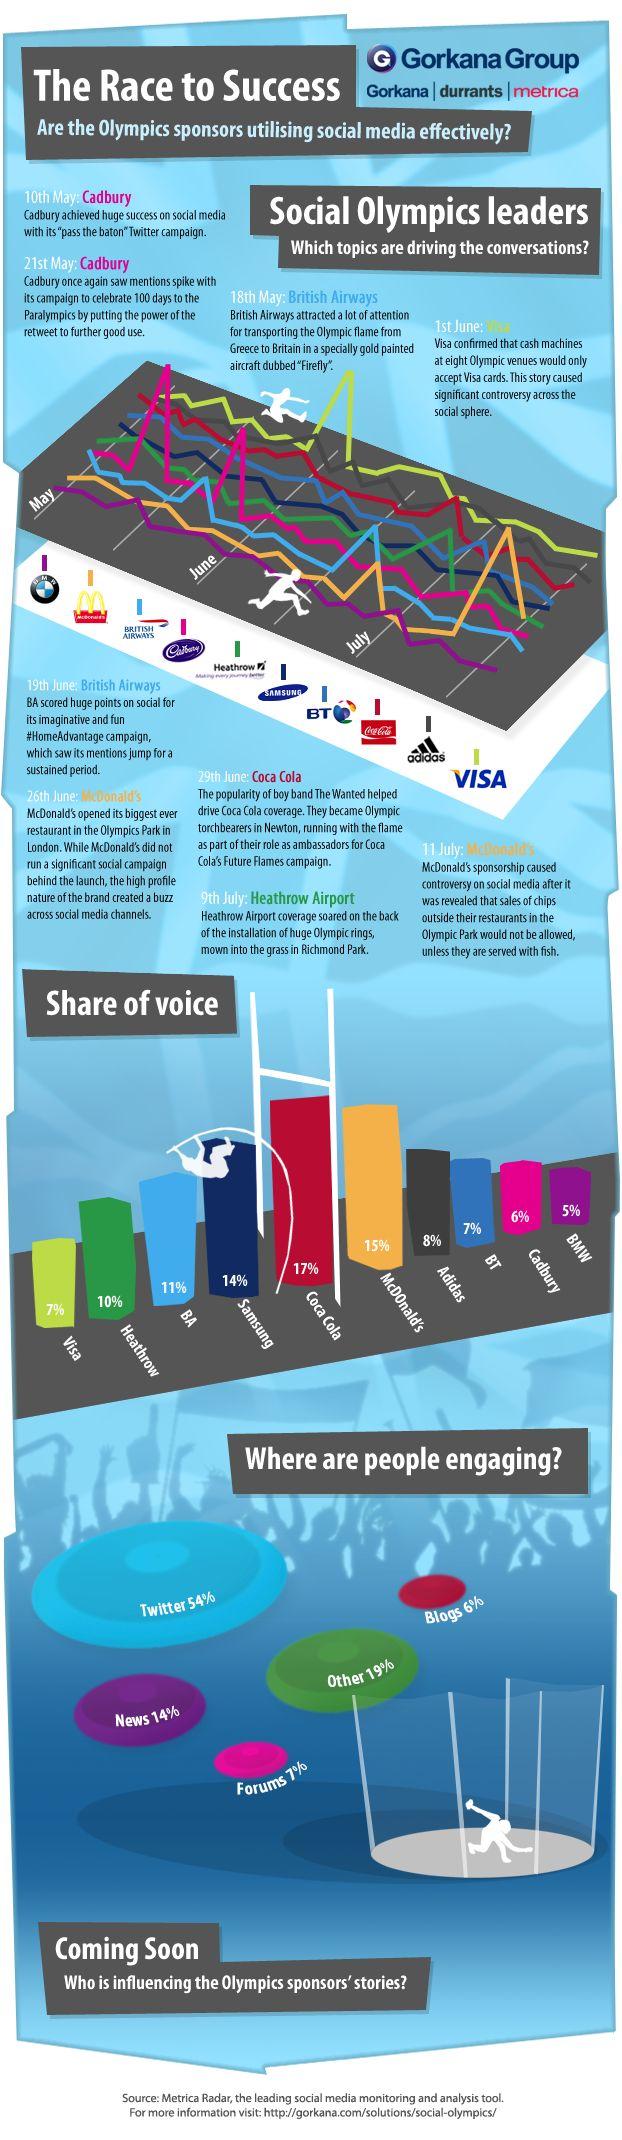 INFOGRAPHIC: Olympics sponsors' social media coverage